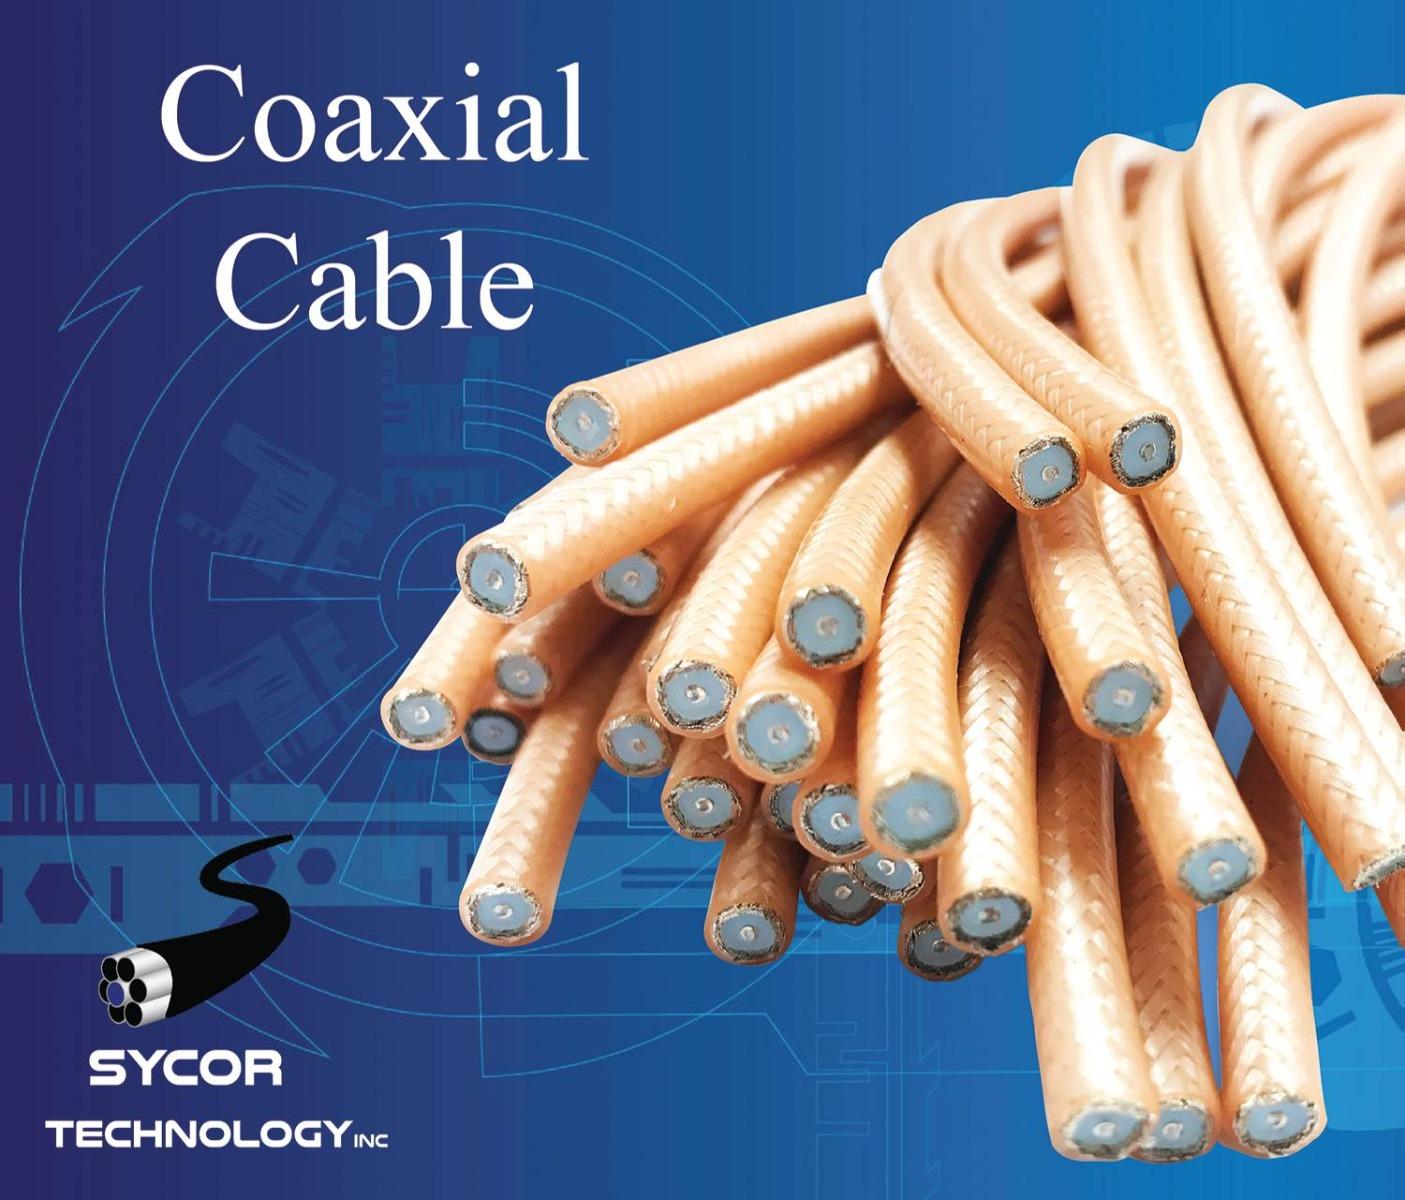 Coaxial Cable Partial Cut